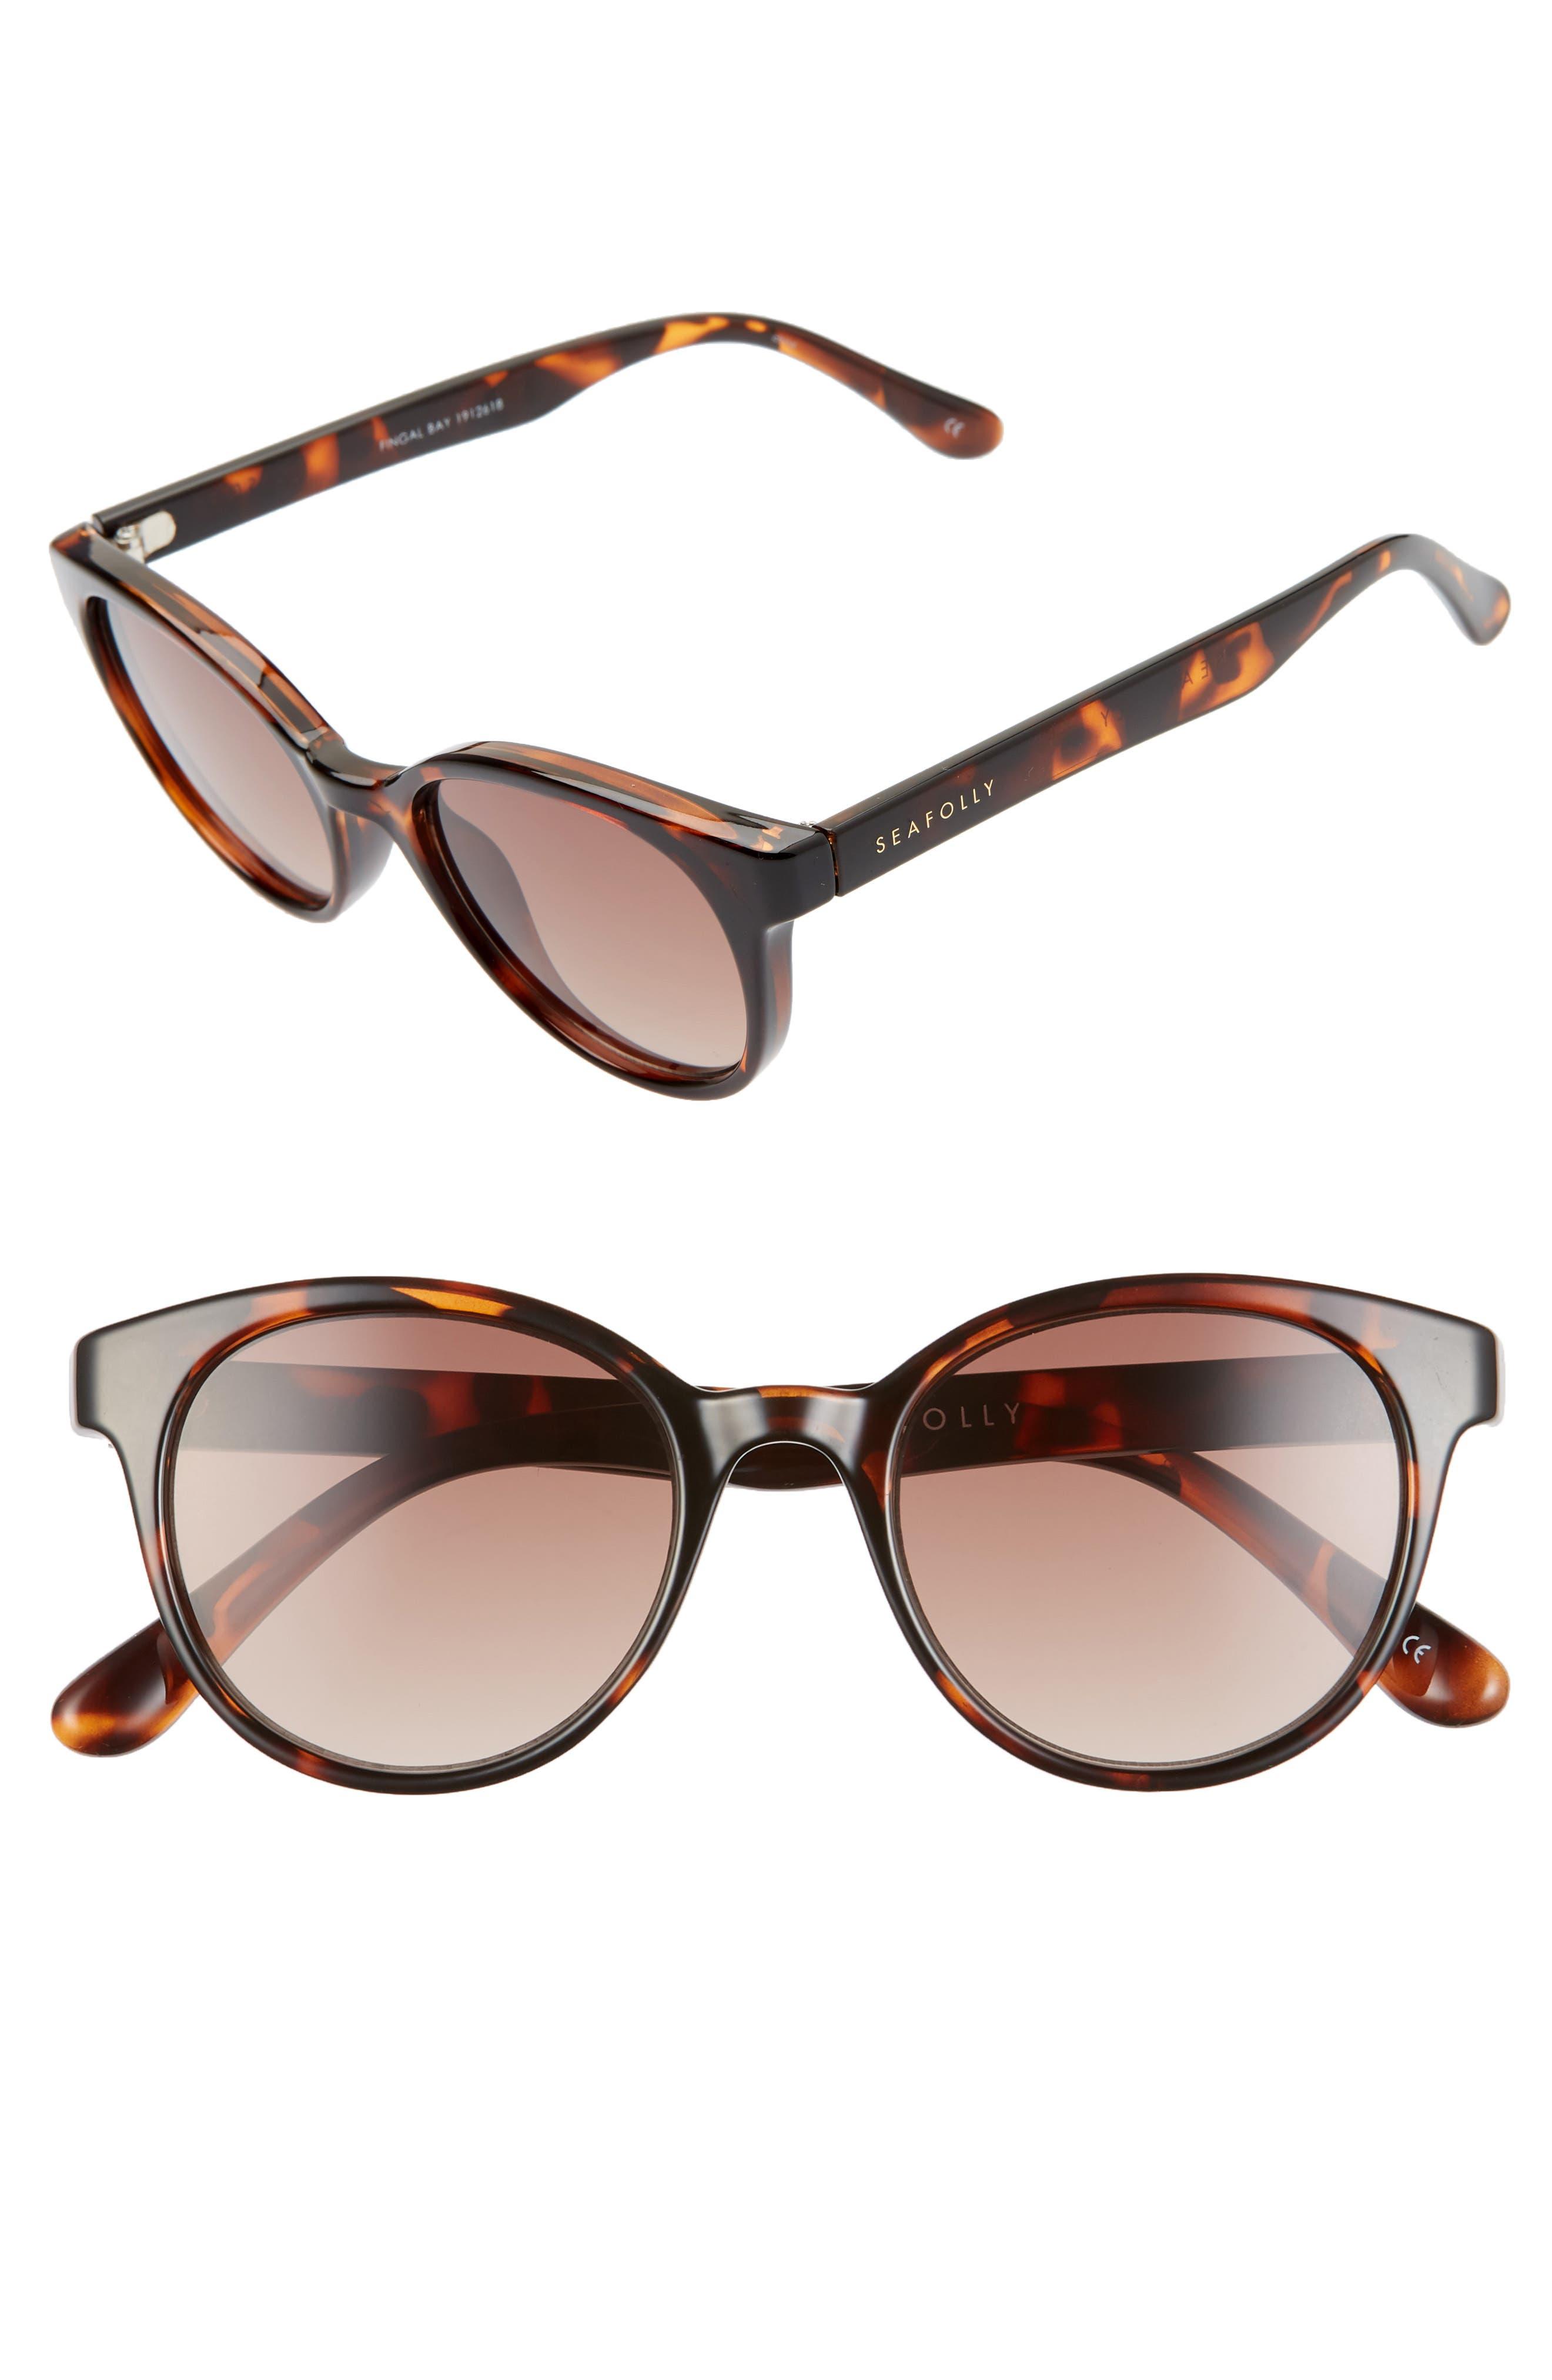 Seafolly Fingal Bay 4m Round Cat Eye Sunglasses - Dark Tortoise/ Brown